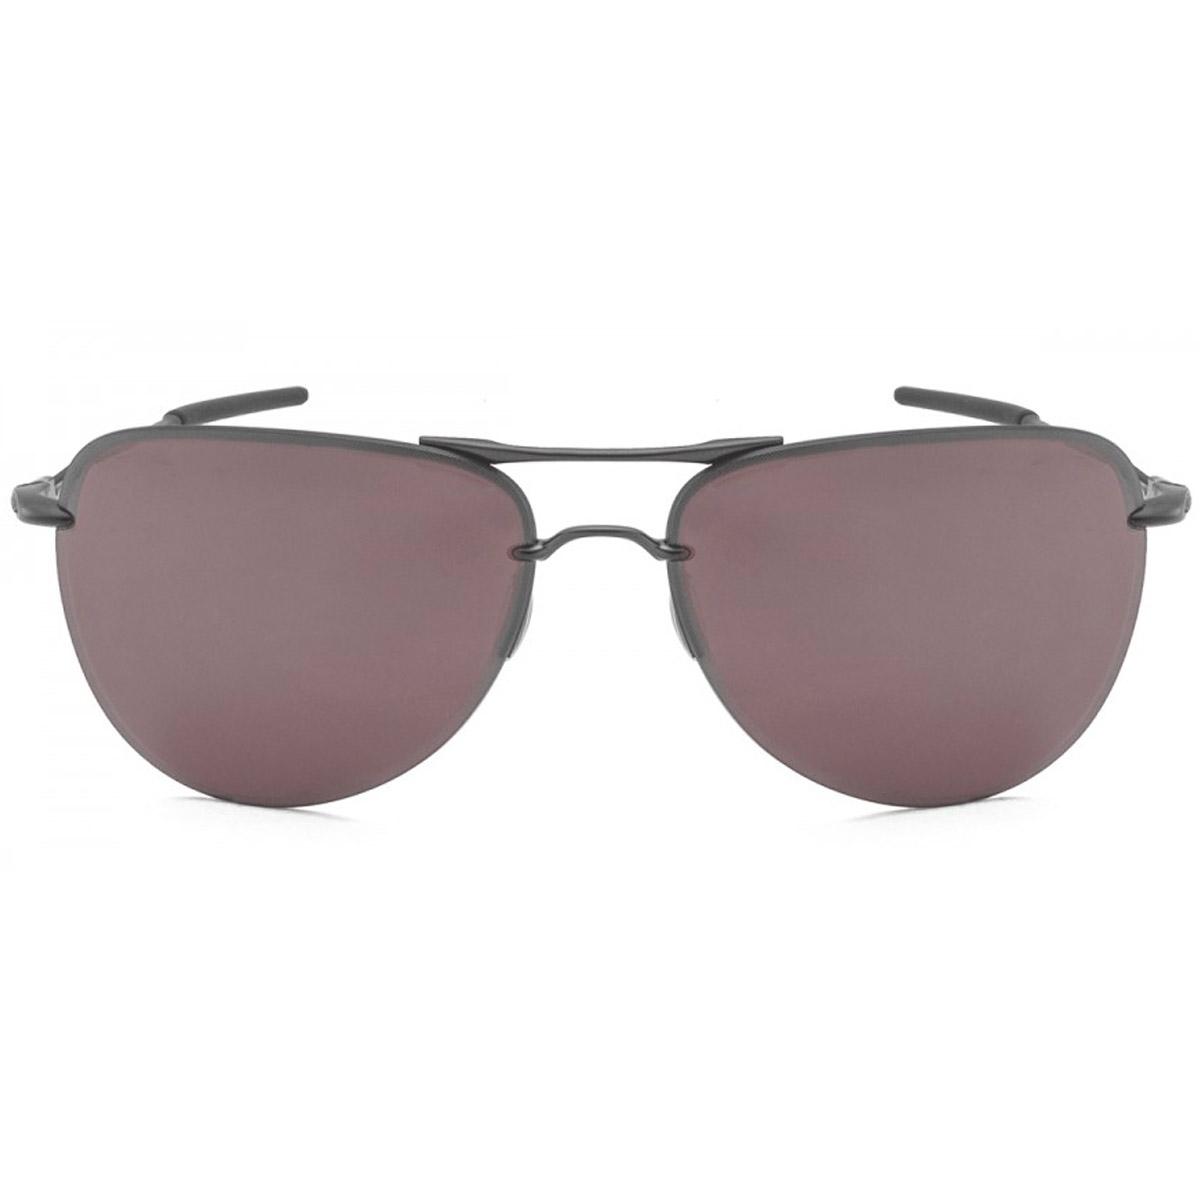 Óculos Oakley Tailpin Carbom Lente Prizm Daily Polarizado ref OO4086-04 6e1b2f4557